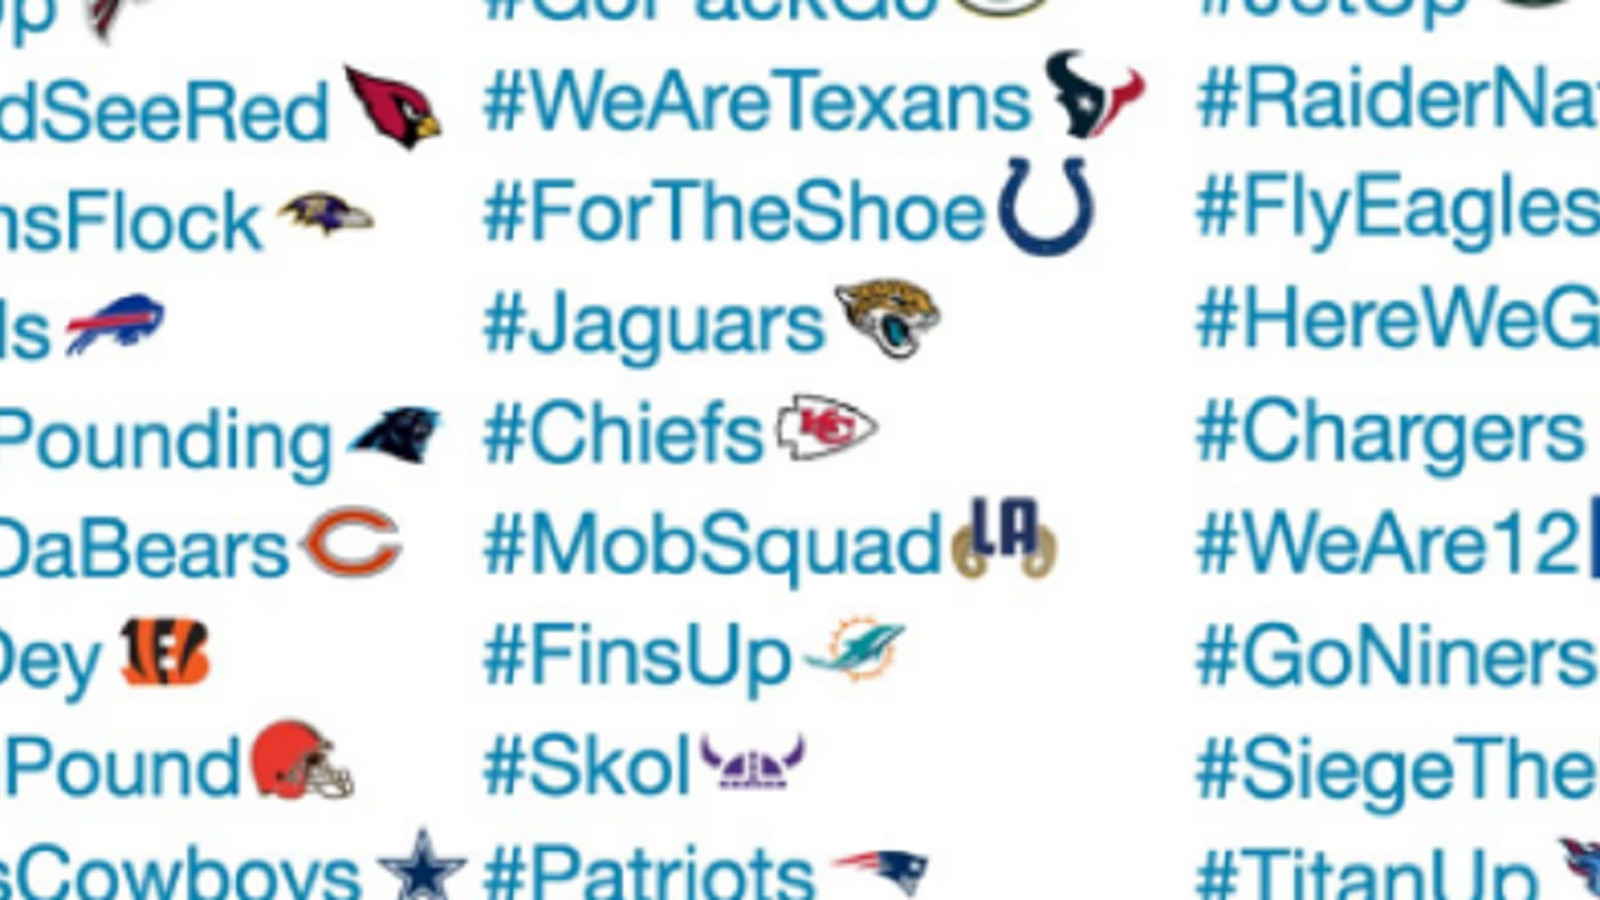 cfbb5cfdca7 Ranking all 32 NFL teams  new Twitter hashtags and emojis - SBNation.com